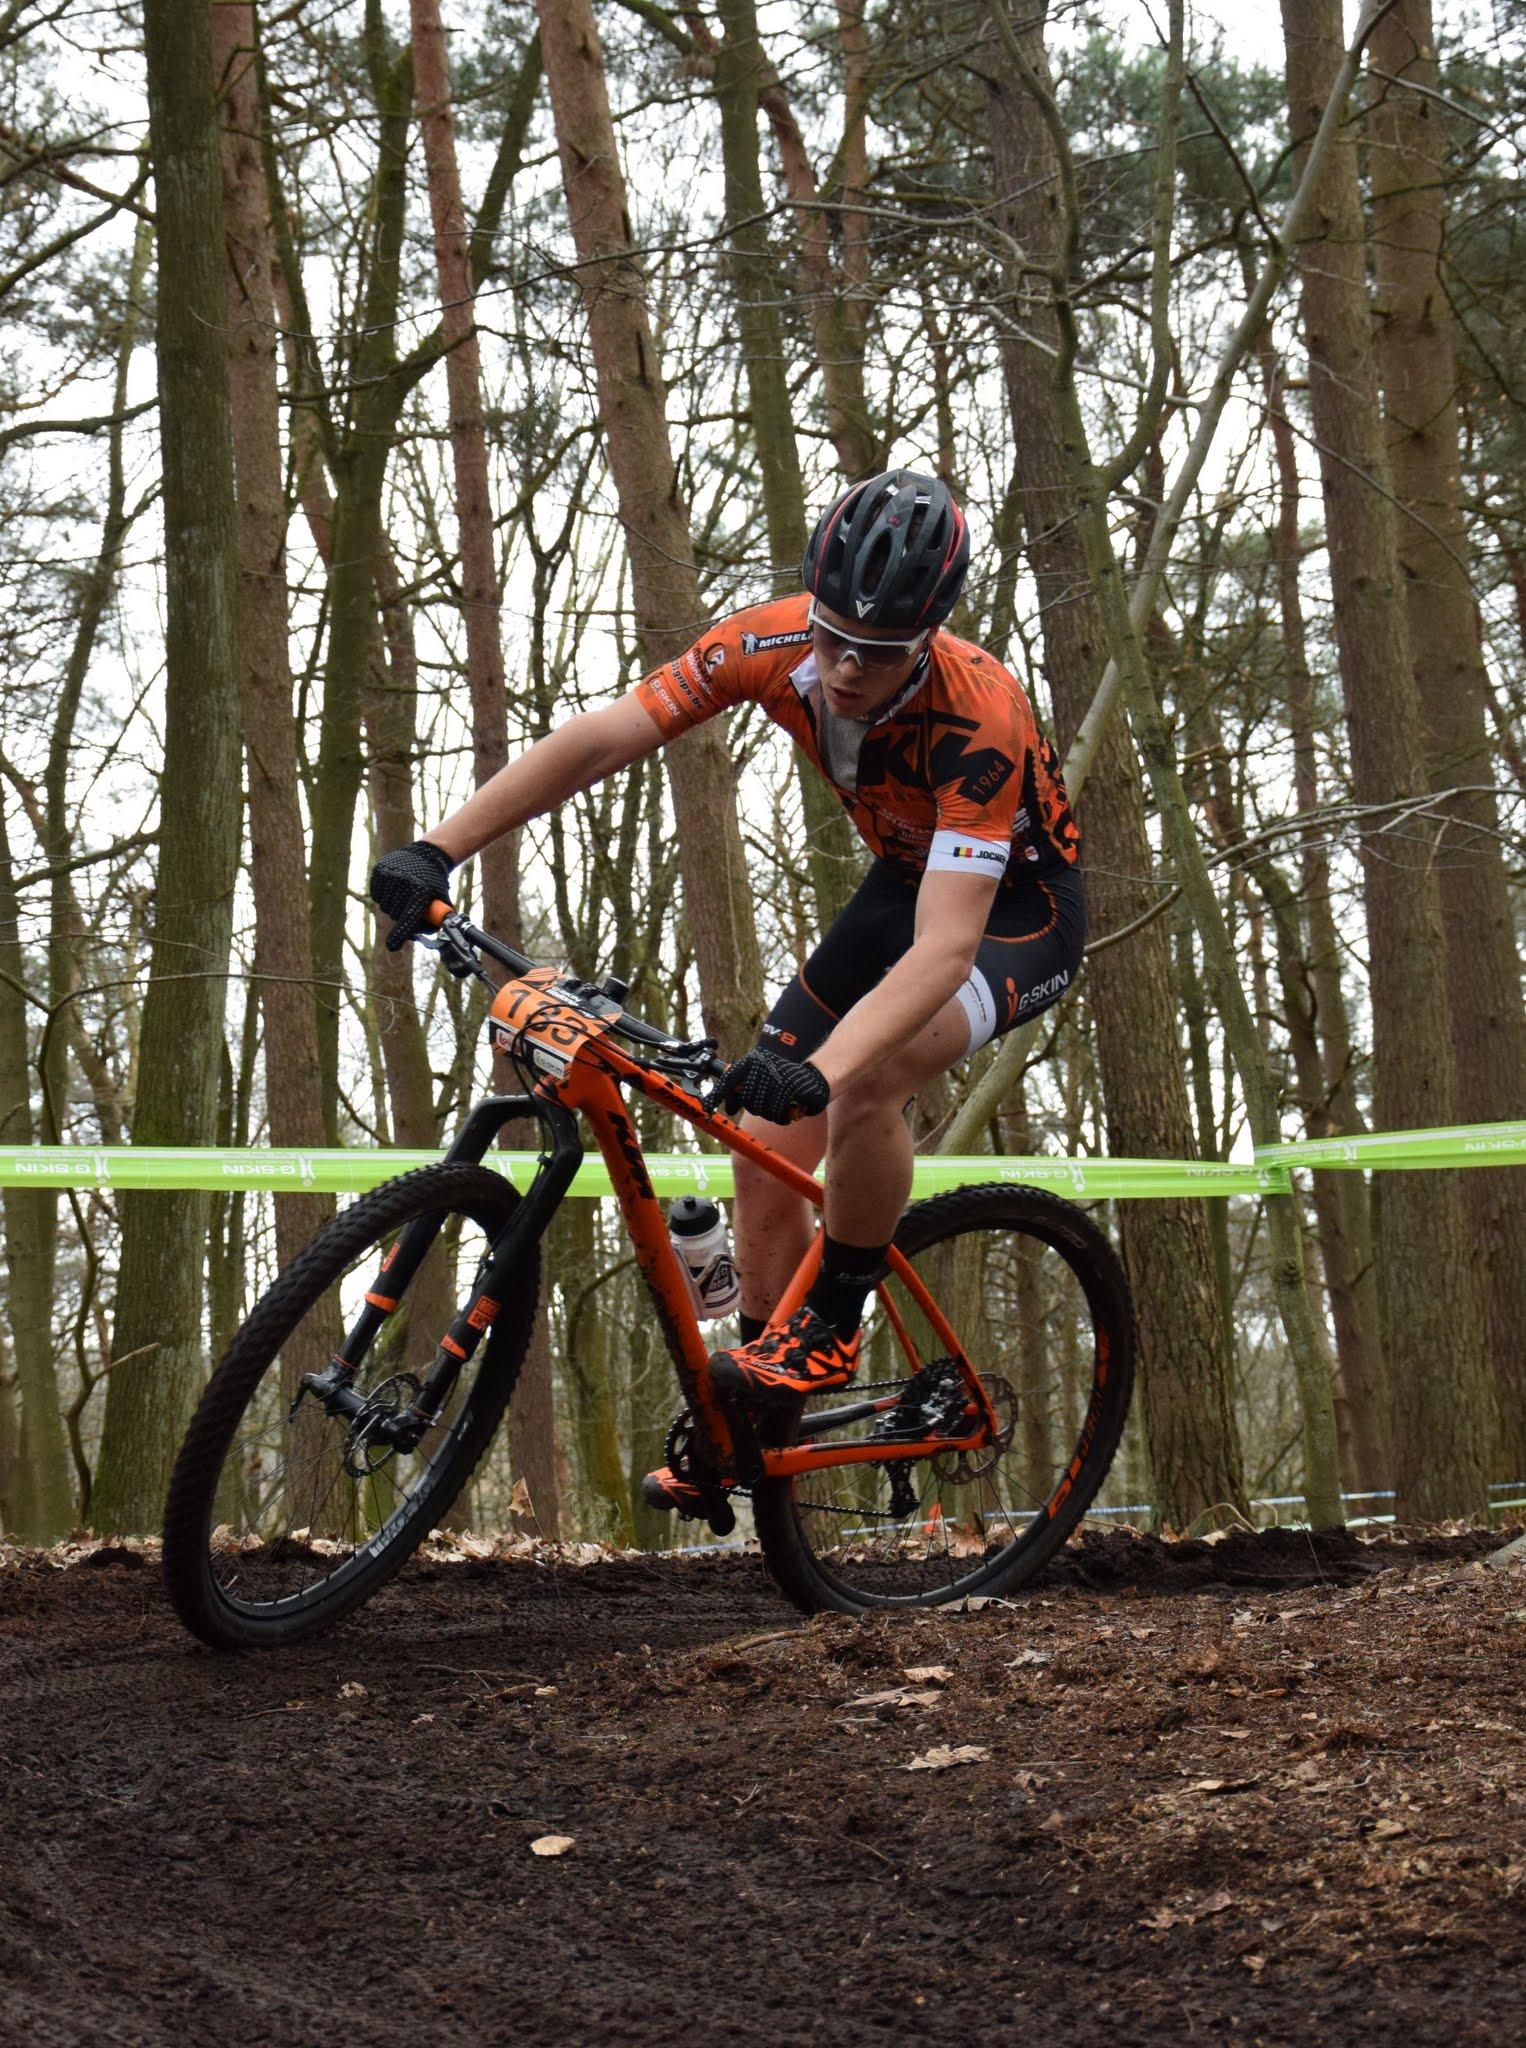 KTM Bikevision bikers blikken terug op Ottignies